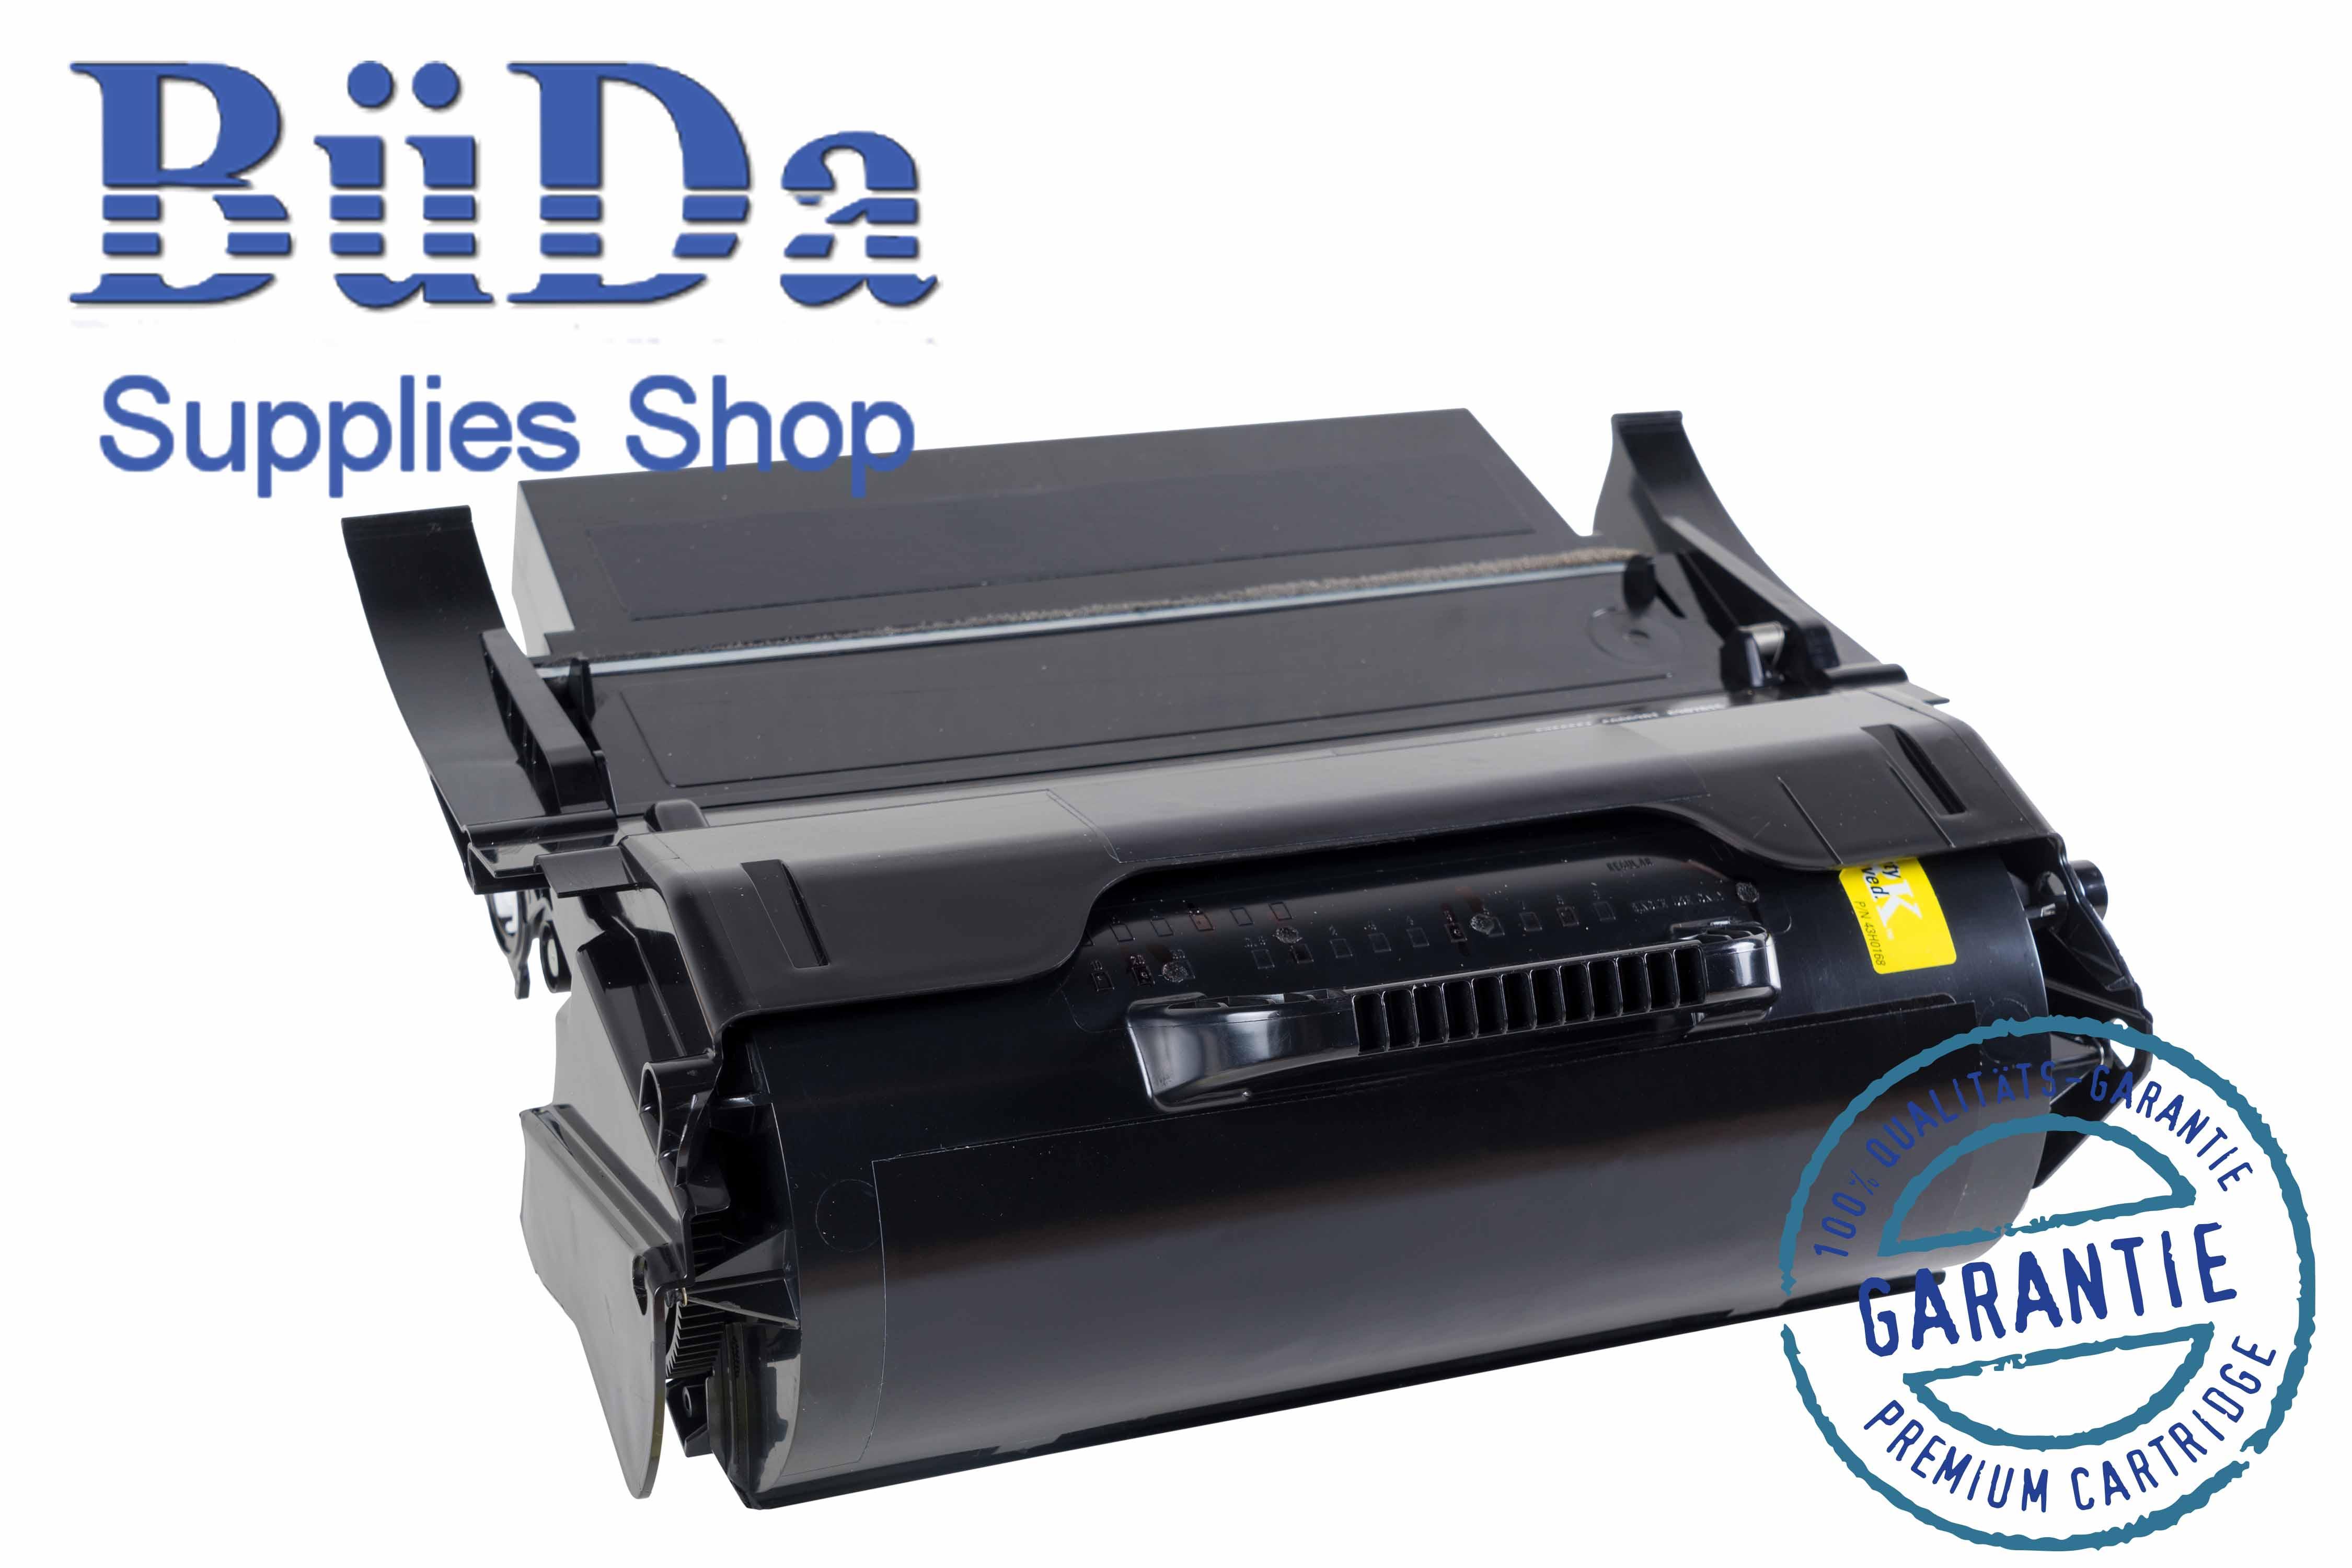 Toner-Modul komp. zu Dell 5230 black 21000 Seiten